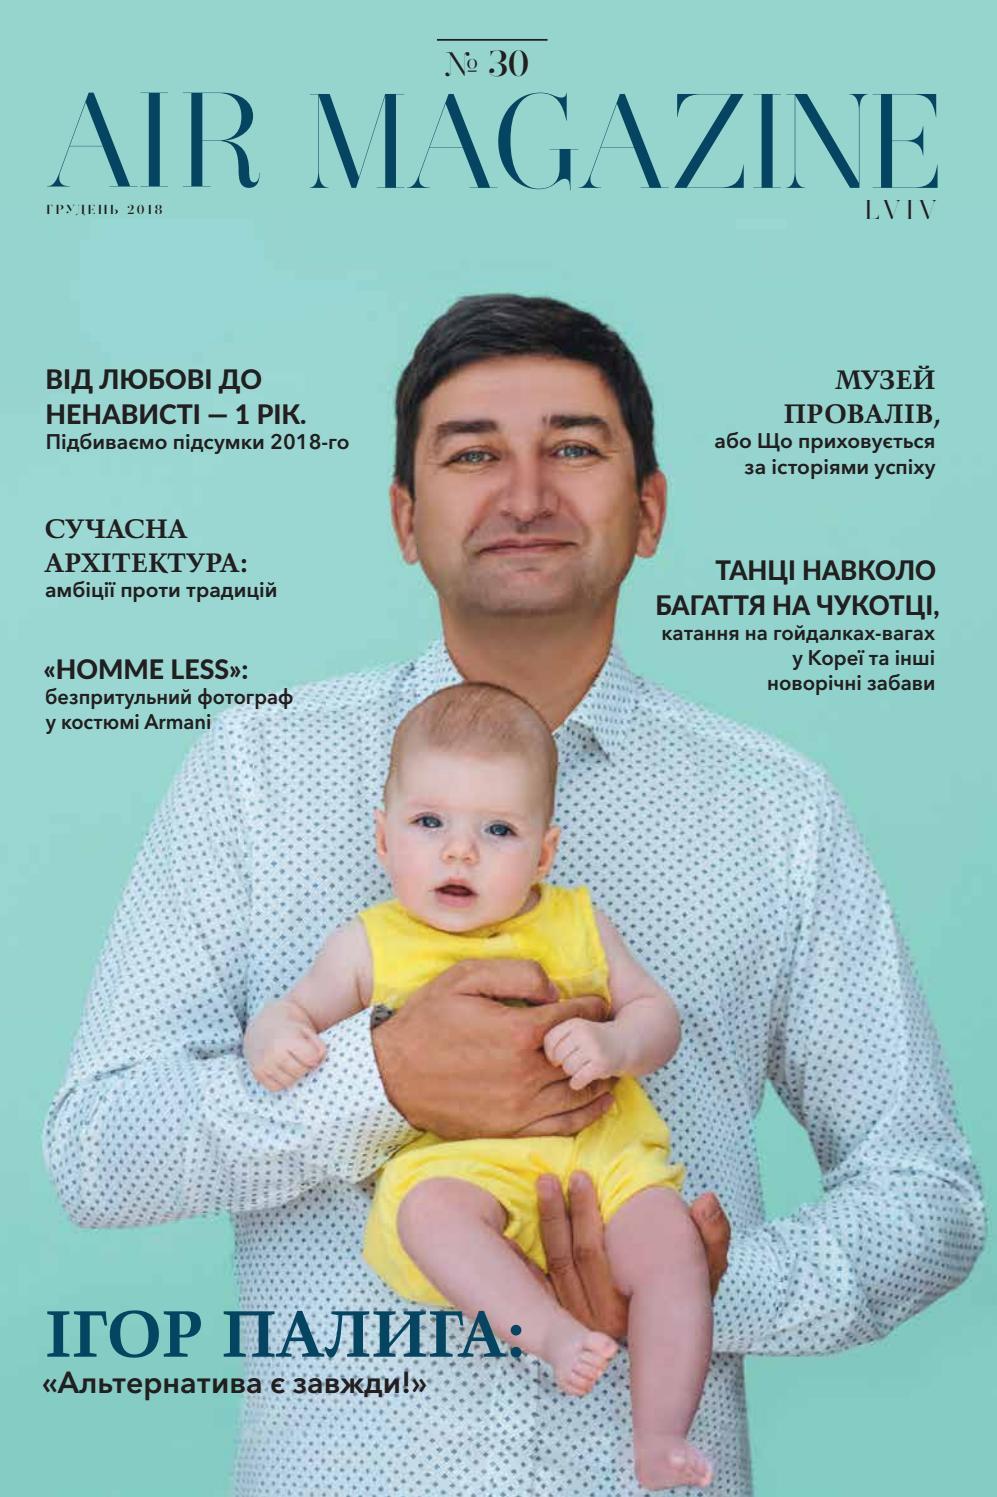 483fa804a9626f Air Magazine Lviv #30 by AIR MAGAZINE LVIV - issuu